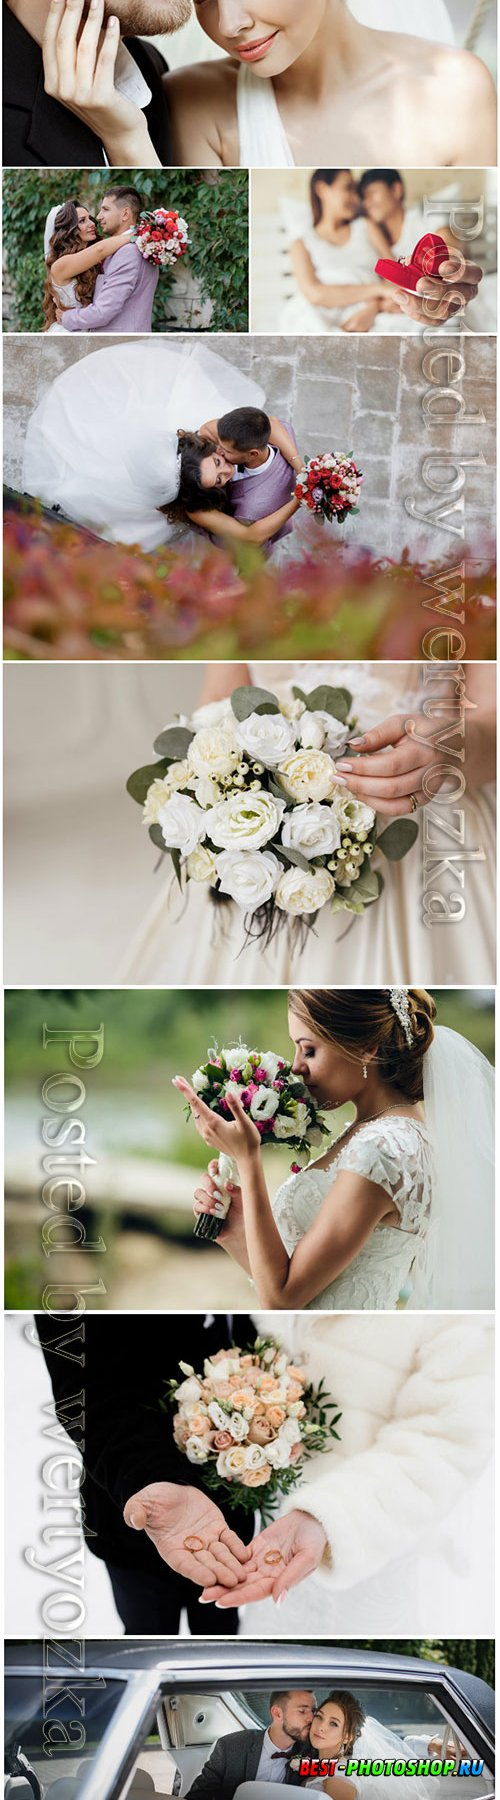 Wedding stock photo, bride and groom